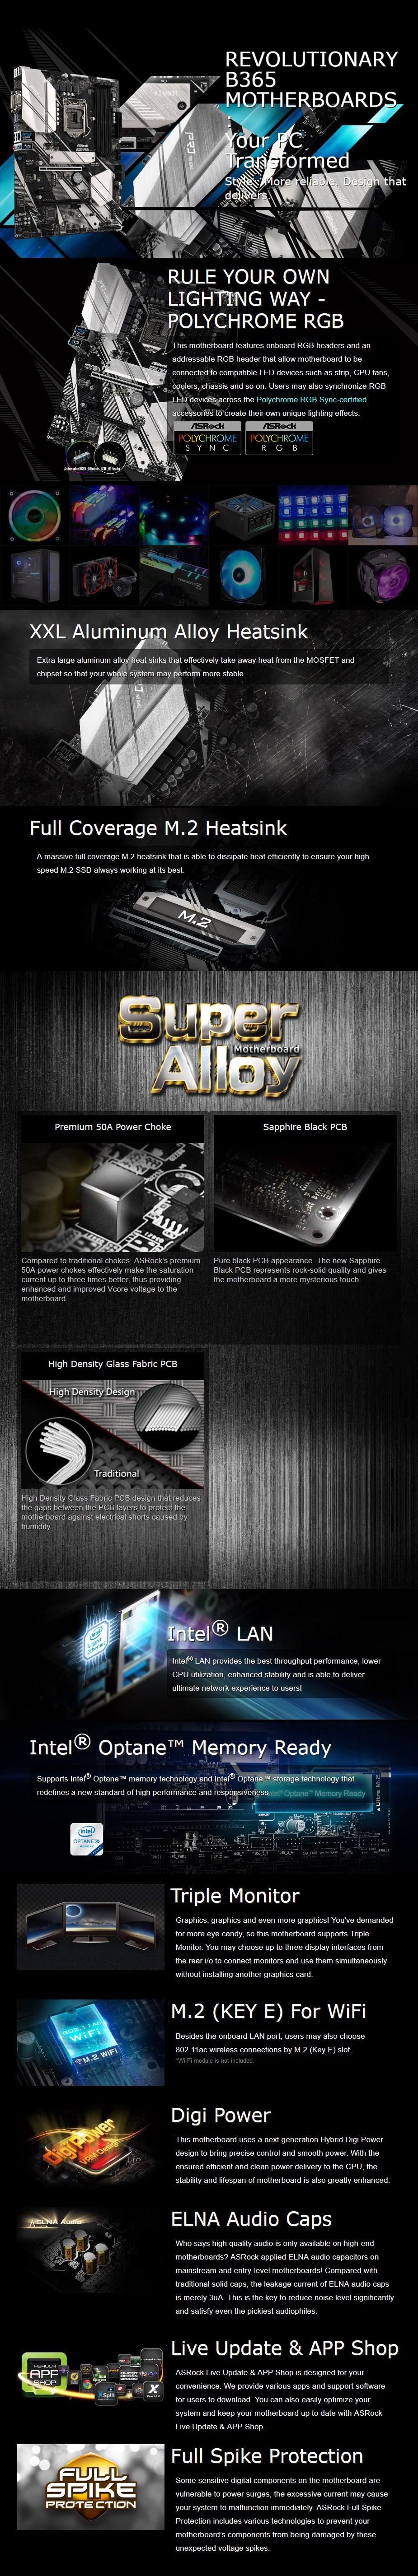 ASRock B365 Pro4 LGA 1151 ATX Motherboard - Desktop Overview 1